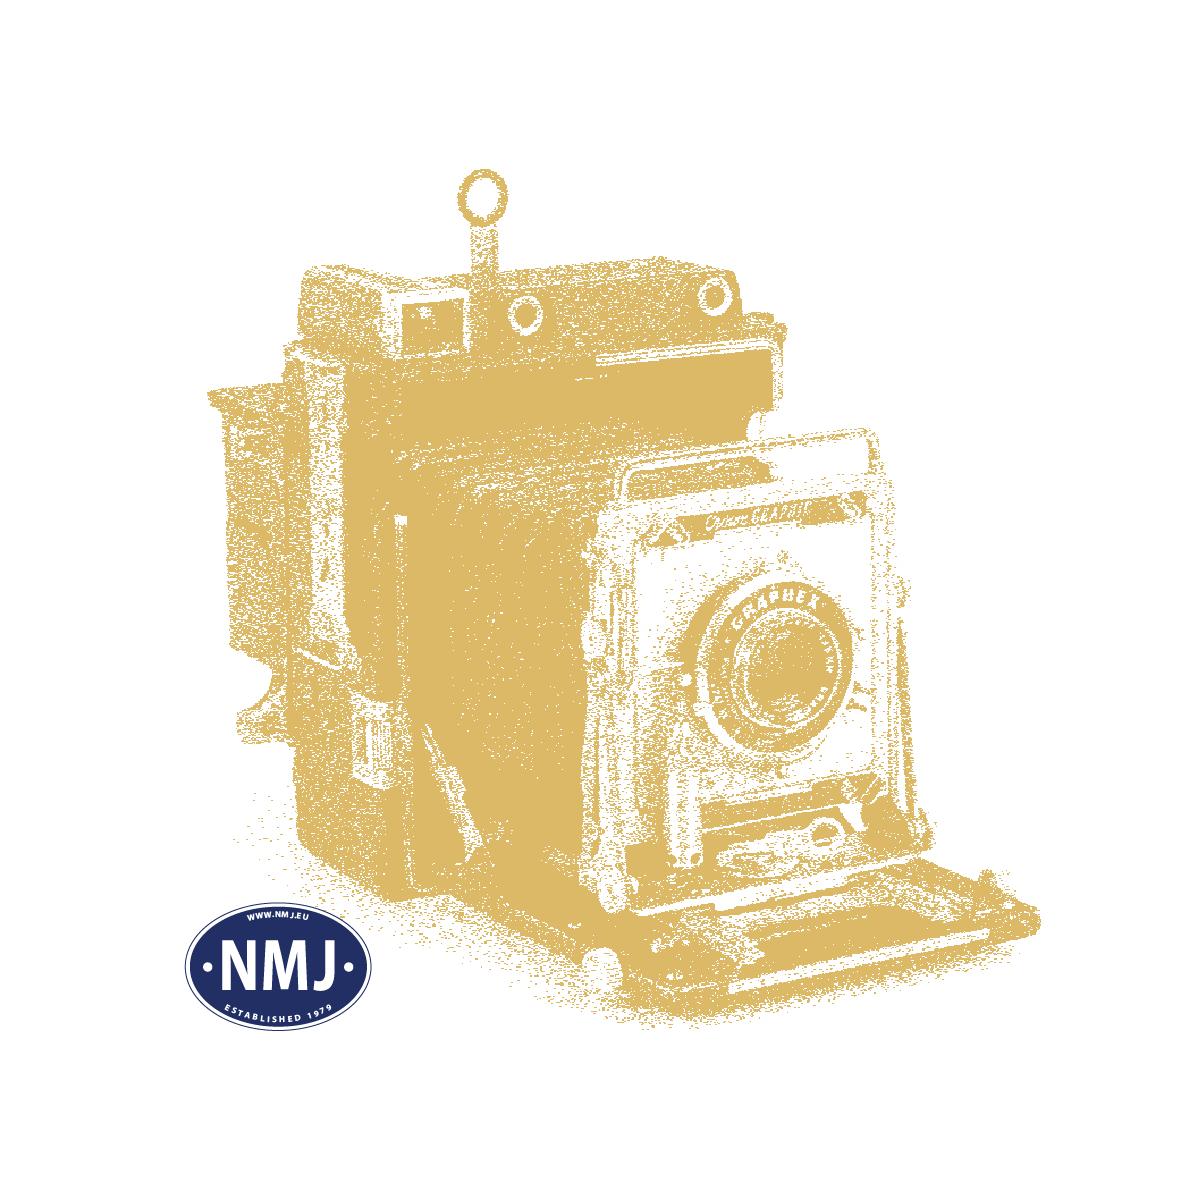 NMJSKAT17 - NMJ Superline Katalog 2017